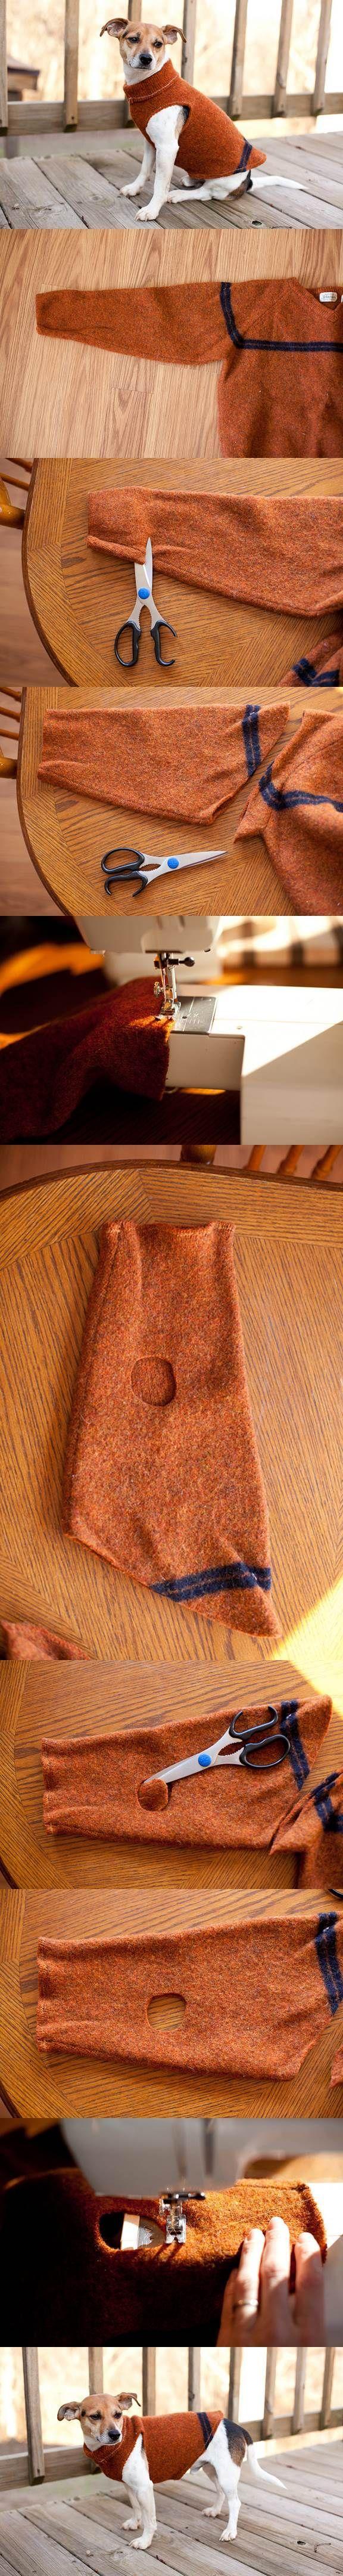 DIY Sweater Sleeve Dog Coat 2